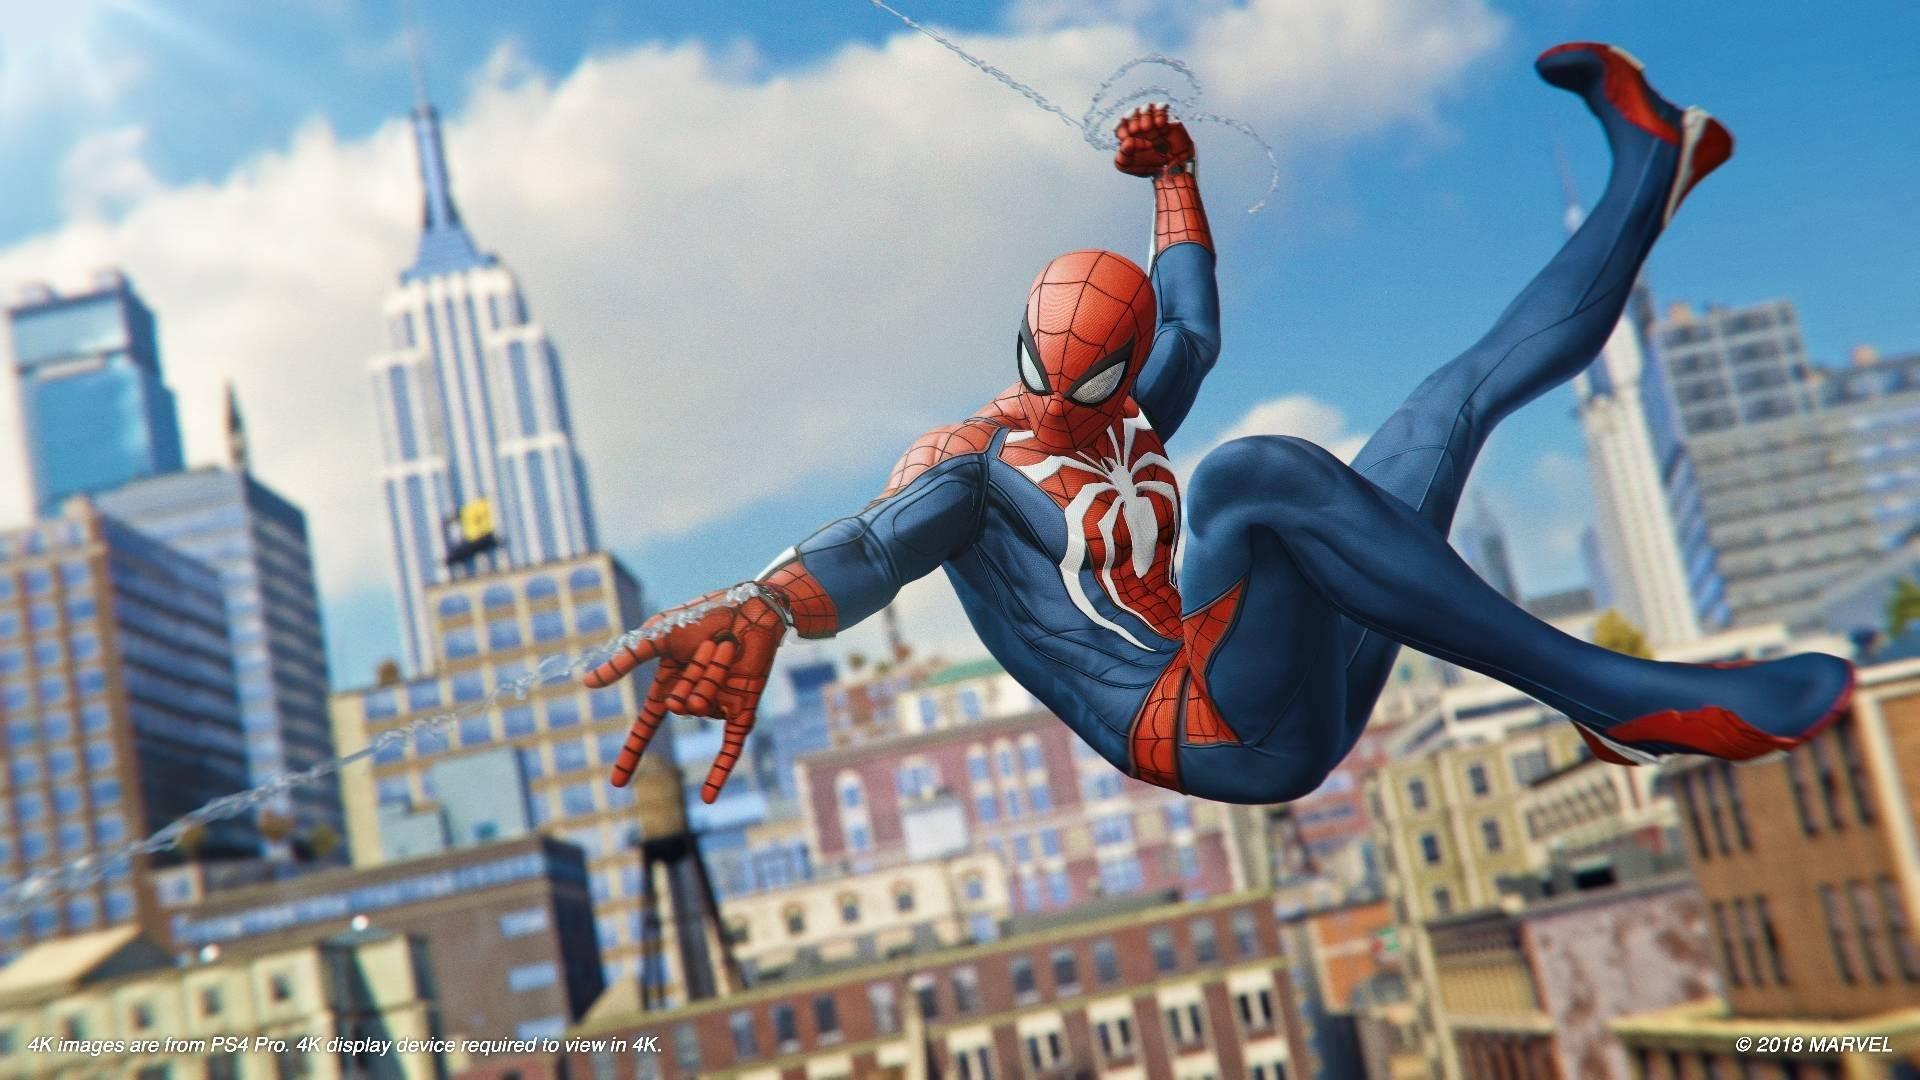 IMAGE(https://images.pushsquare.com/cadbe404c1e09/marvels-spider-man-ps4-playstation-4.original.jpg)